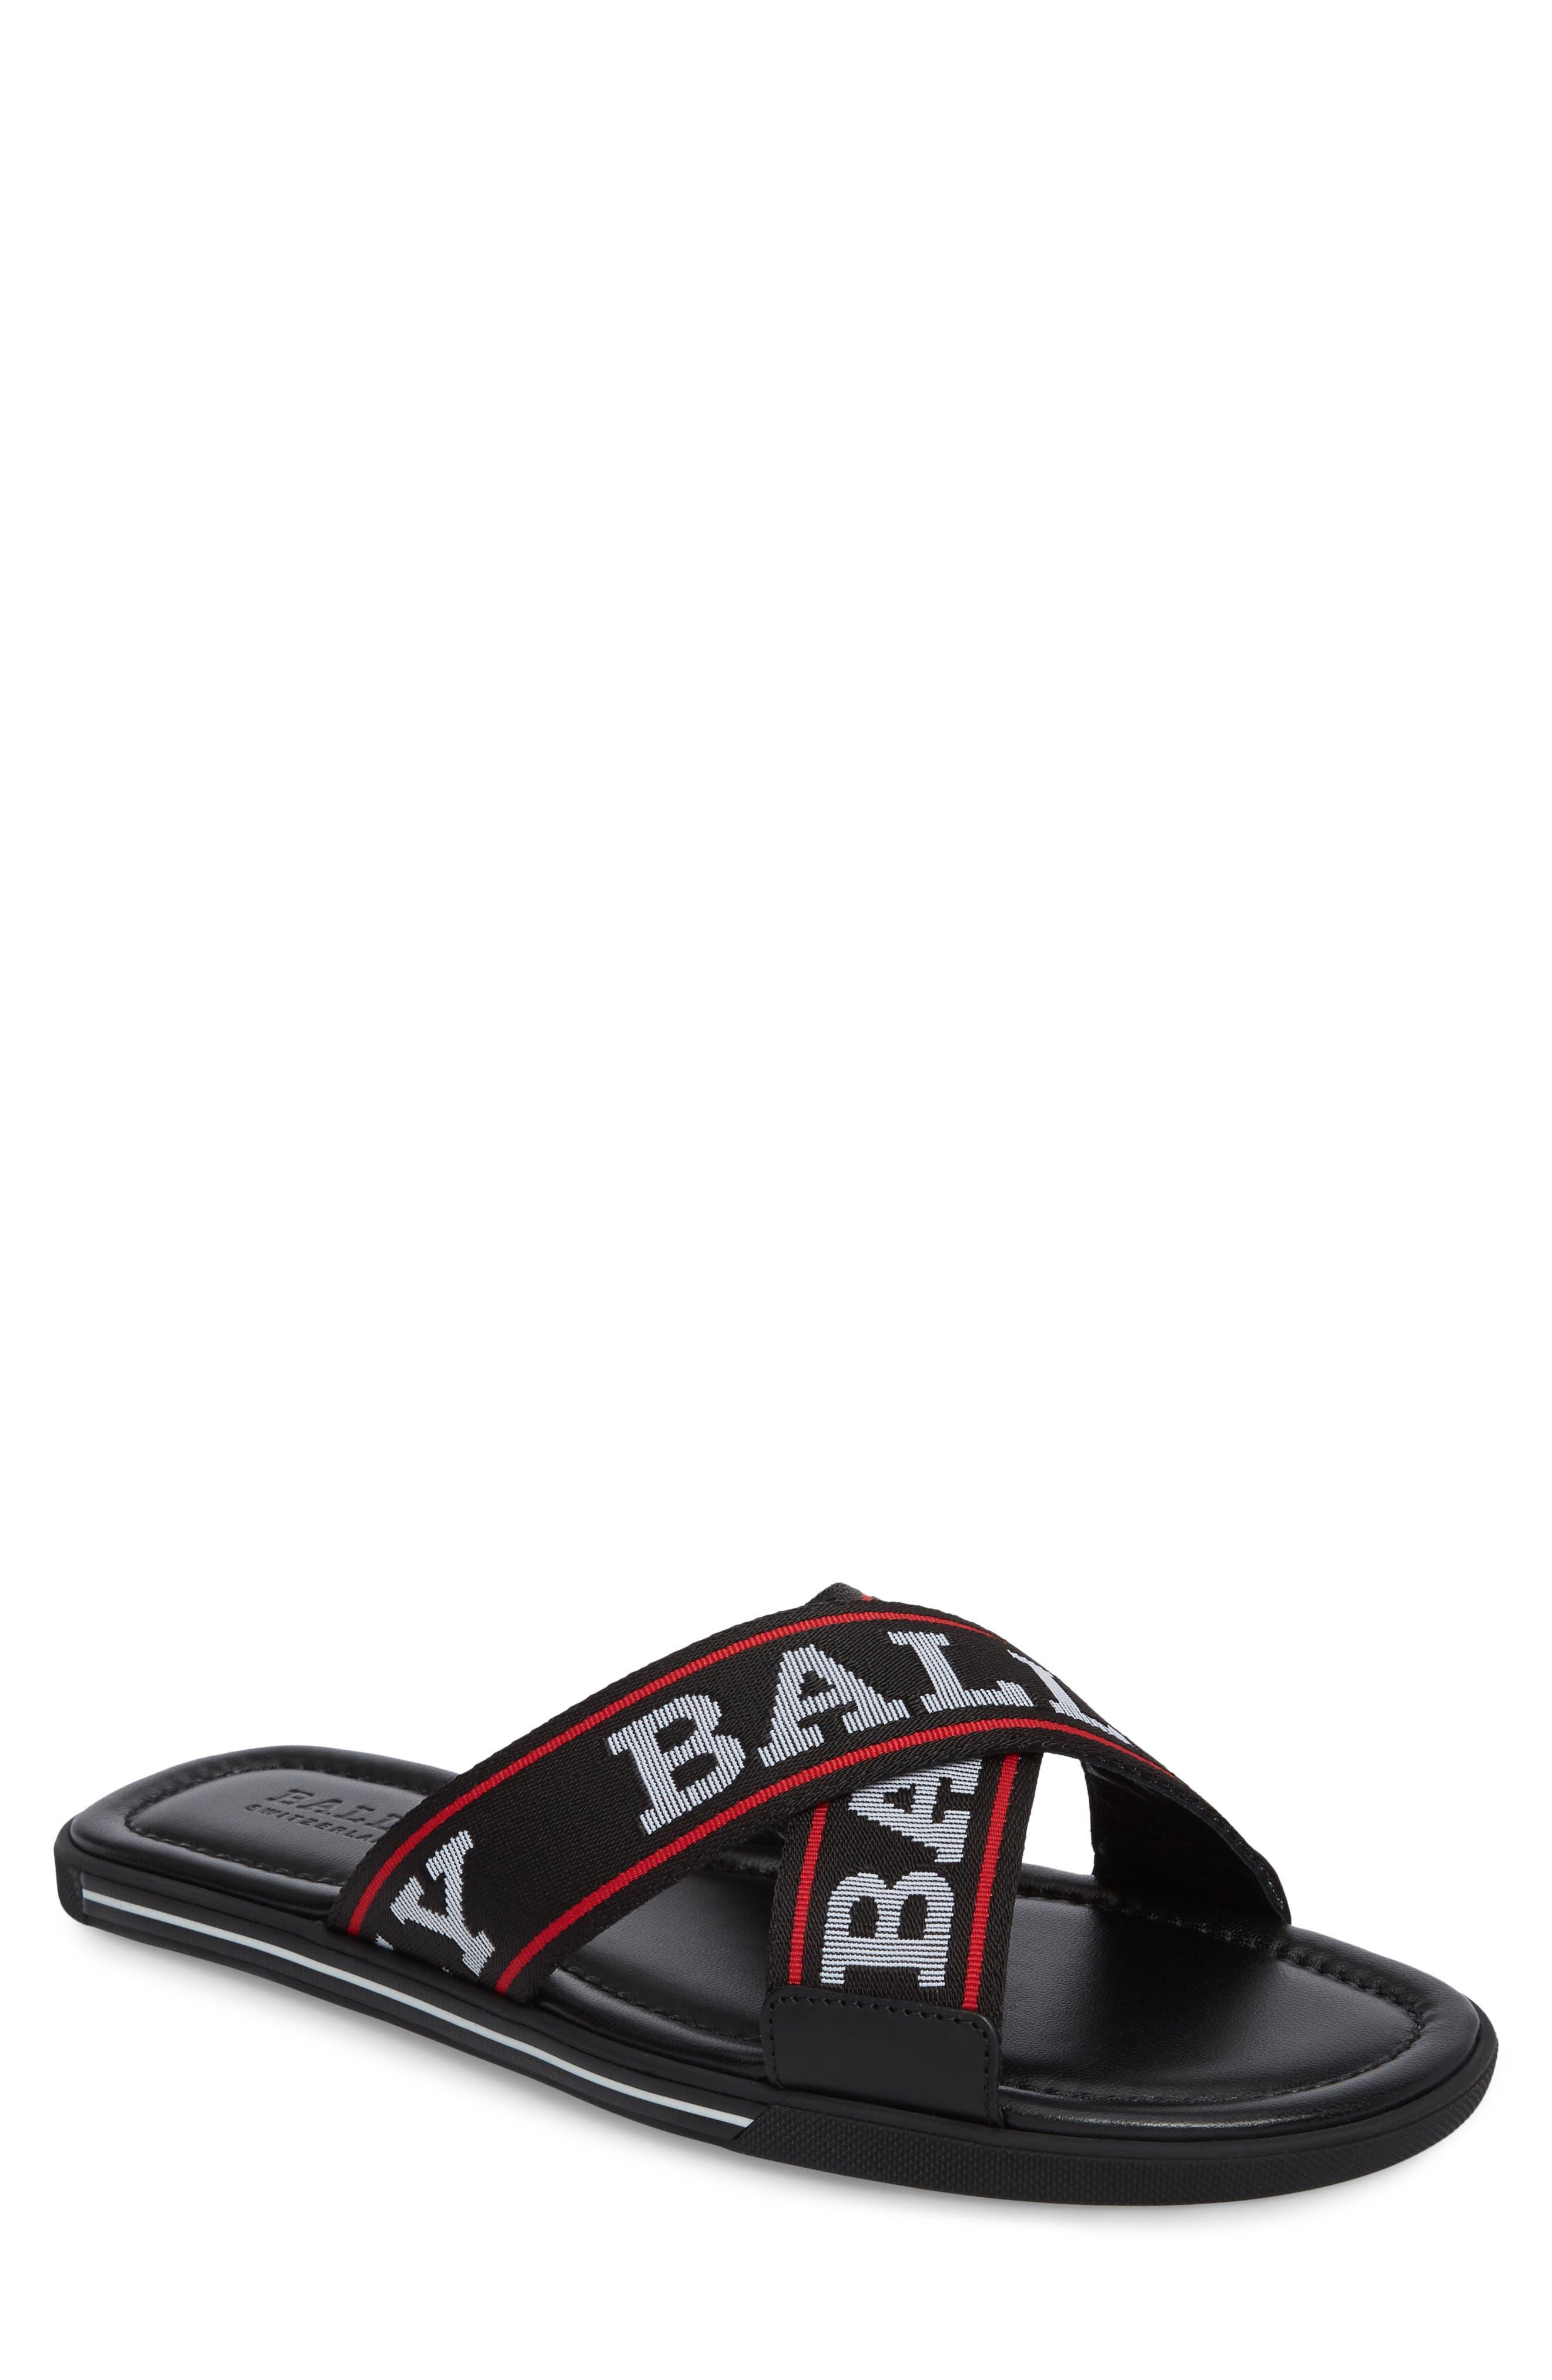 Bonks Logo Slide Sandal,                             Main thumbnail 1, color,                             Black/ Bone/ Red